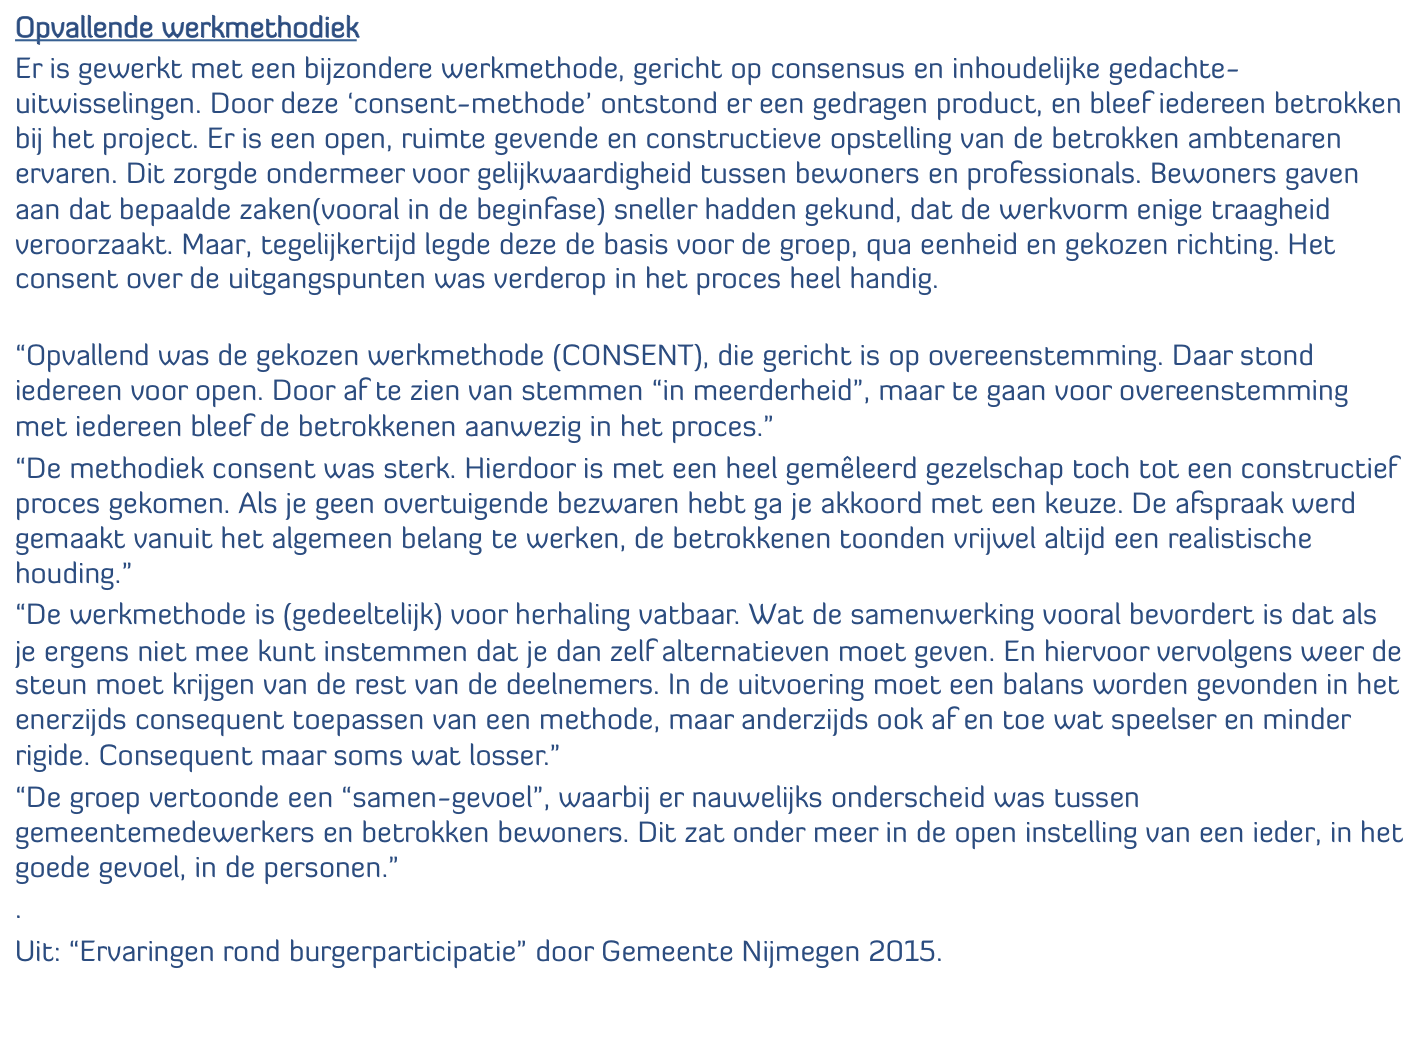 ervaring consent 1 meting participatie.png